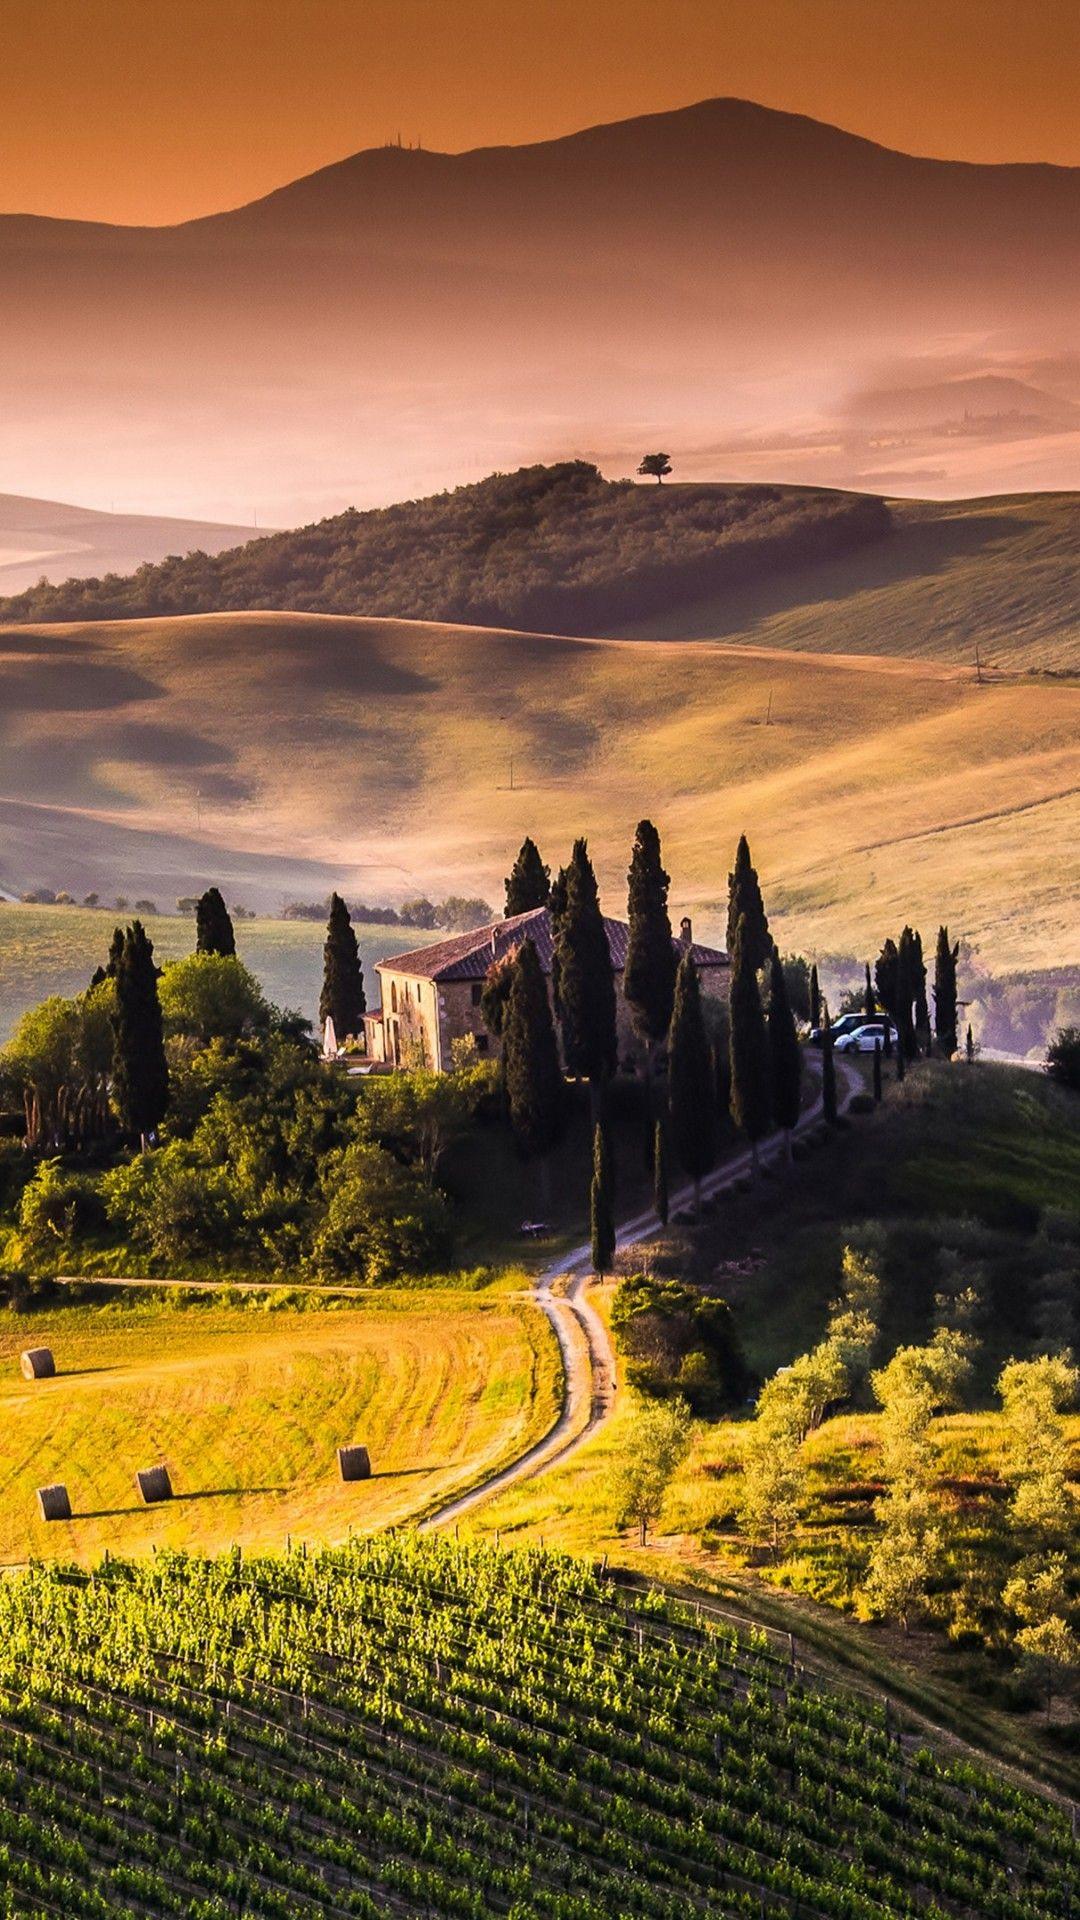 Landscape 4k ultra hd wallpaper tuscany landscape 4k - Nature wallpaper 4k iphone ...